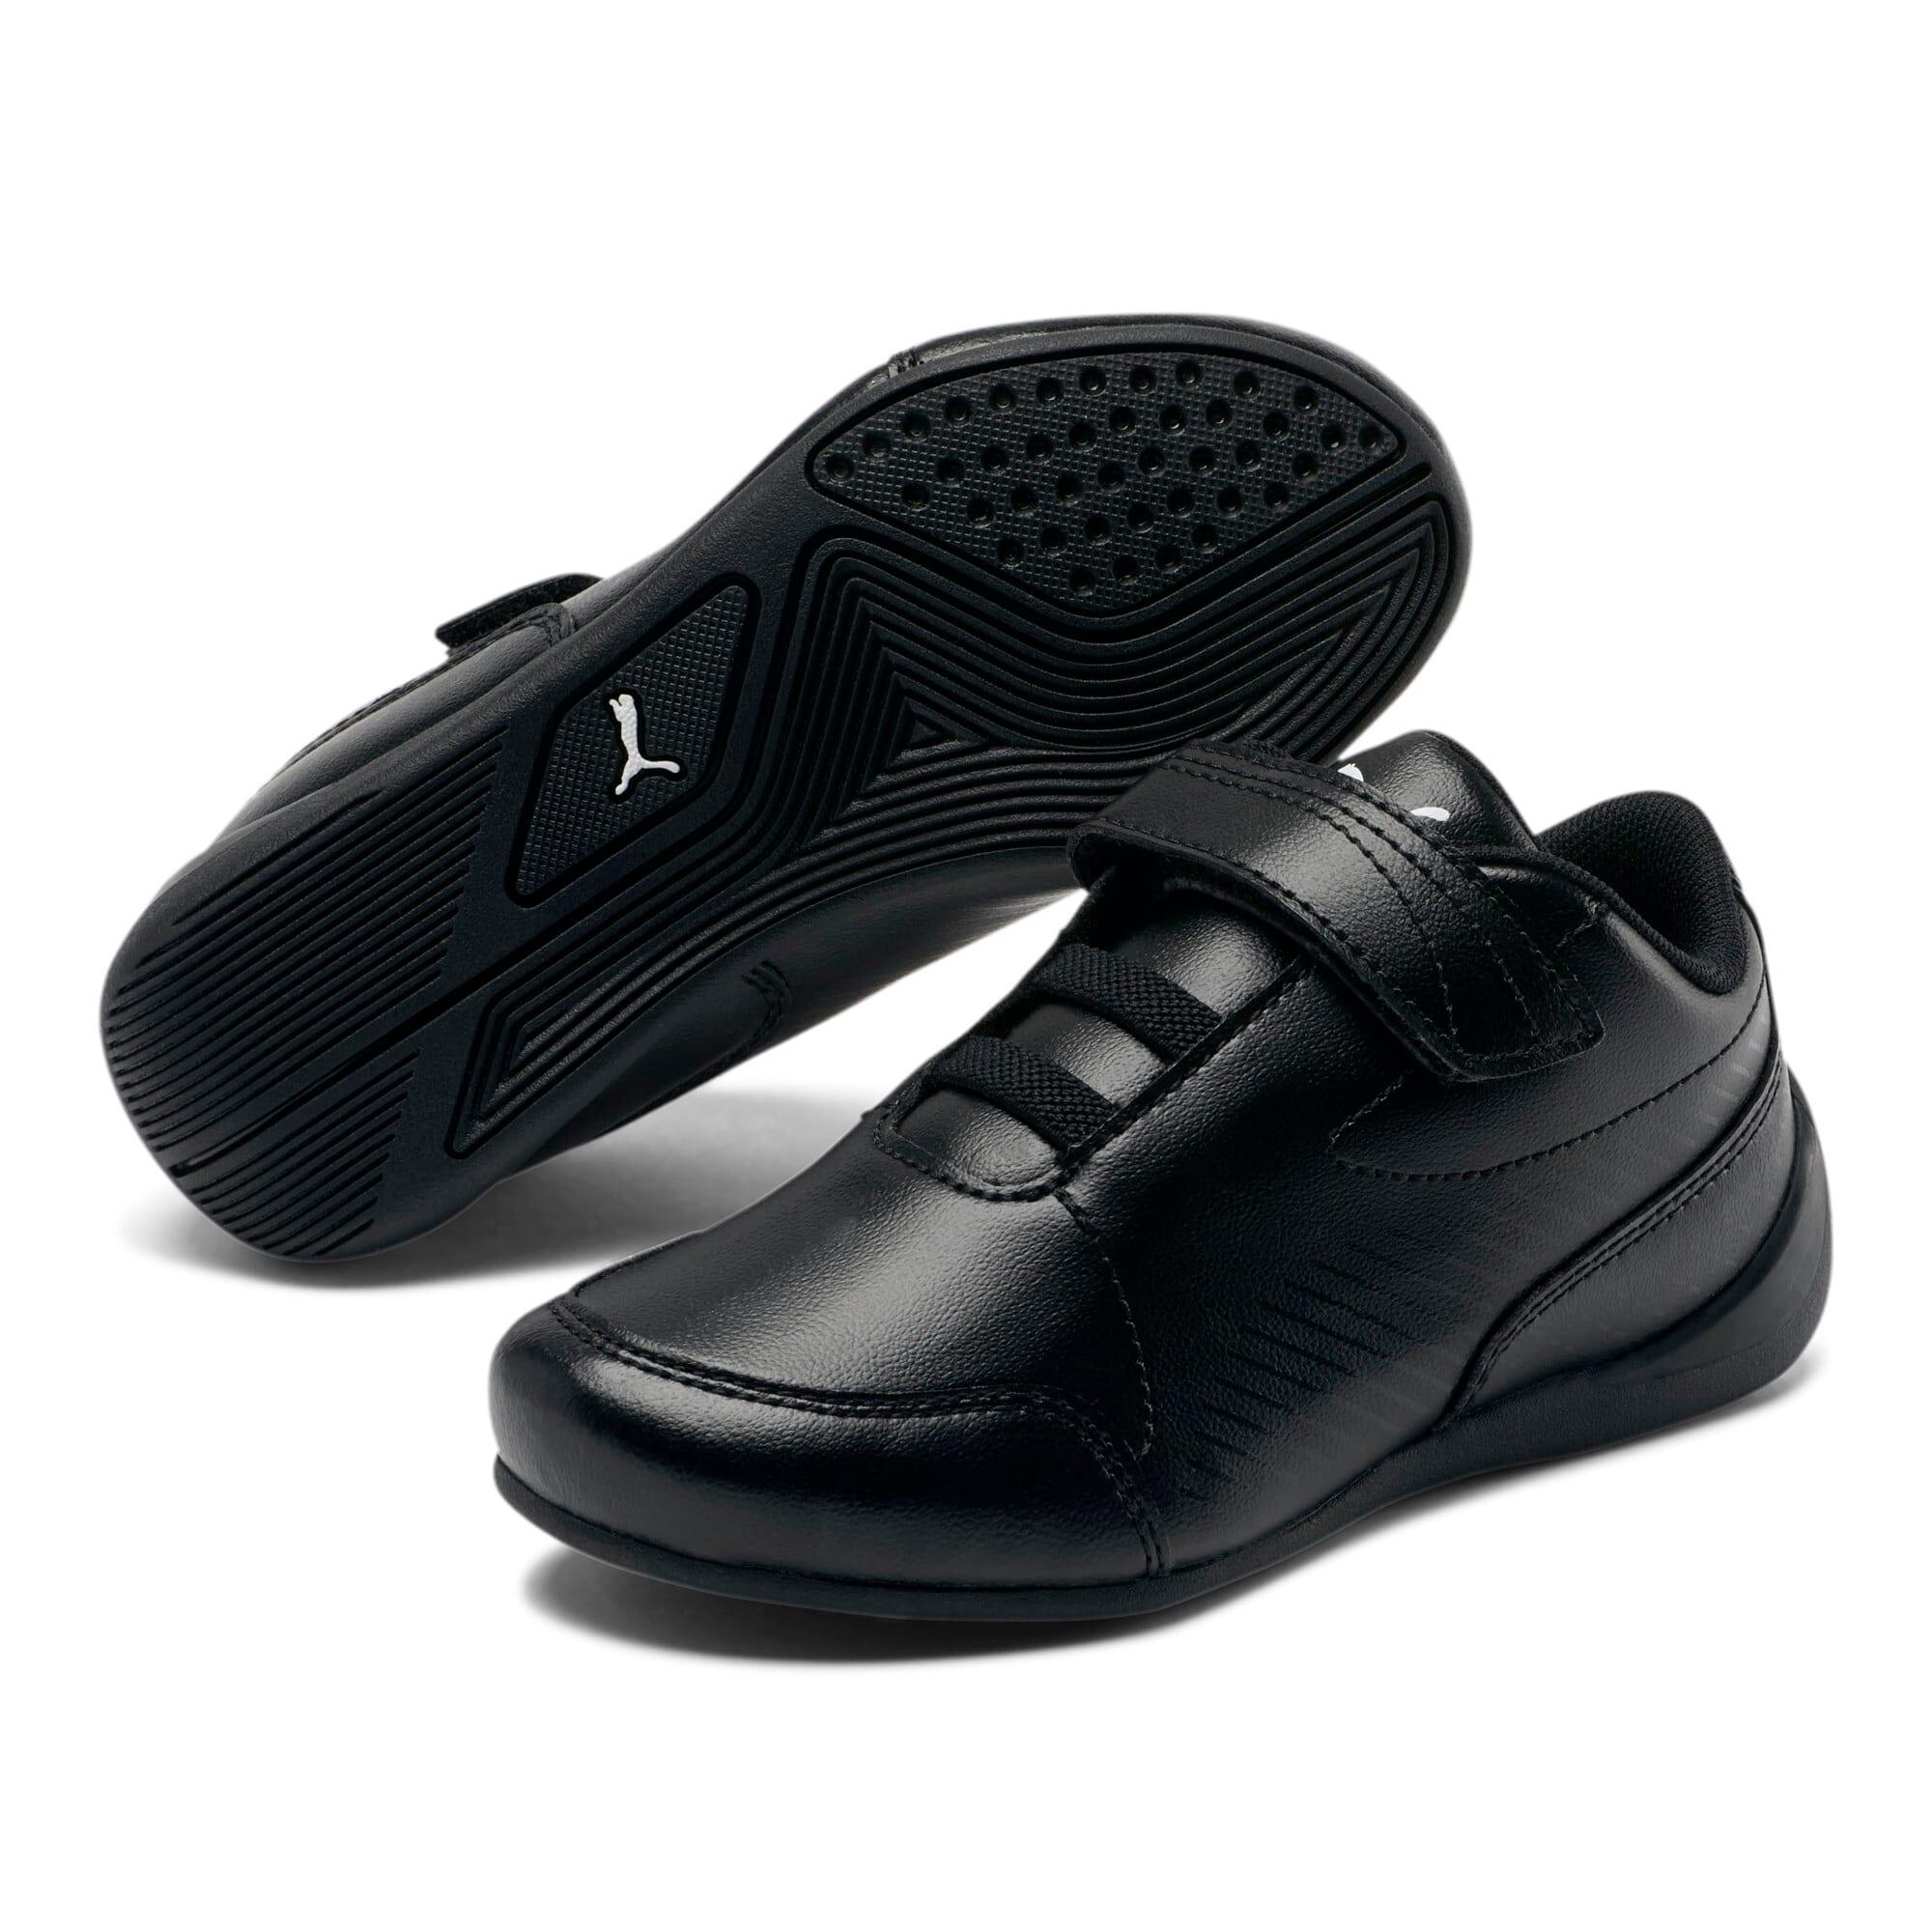 Thumbnail 2 of Drift Cat 7S Ultra Little Kids' Shoes, Puma Black-Puma Black, medium